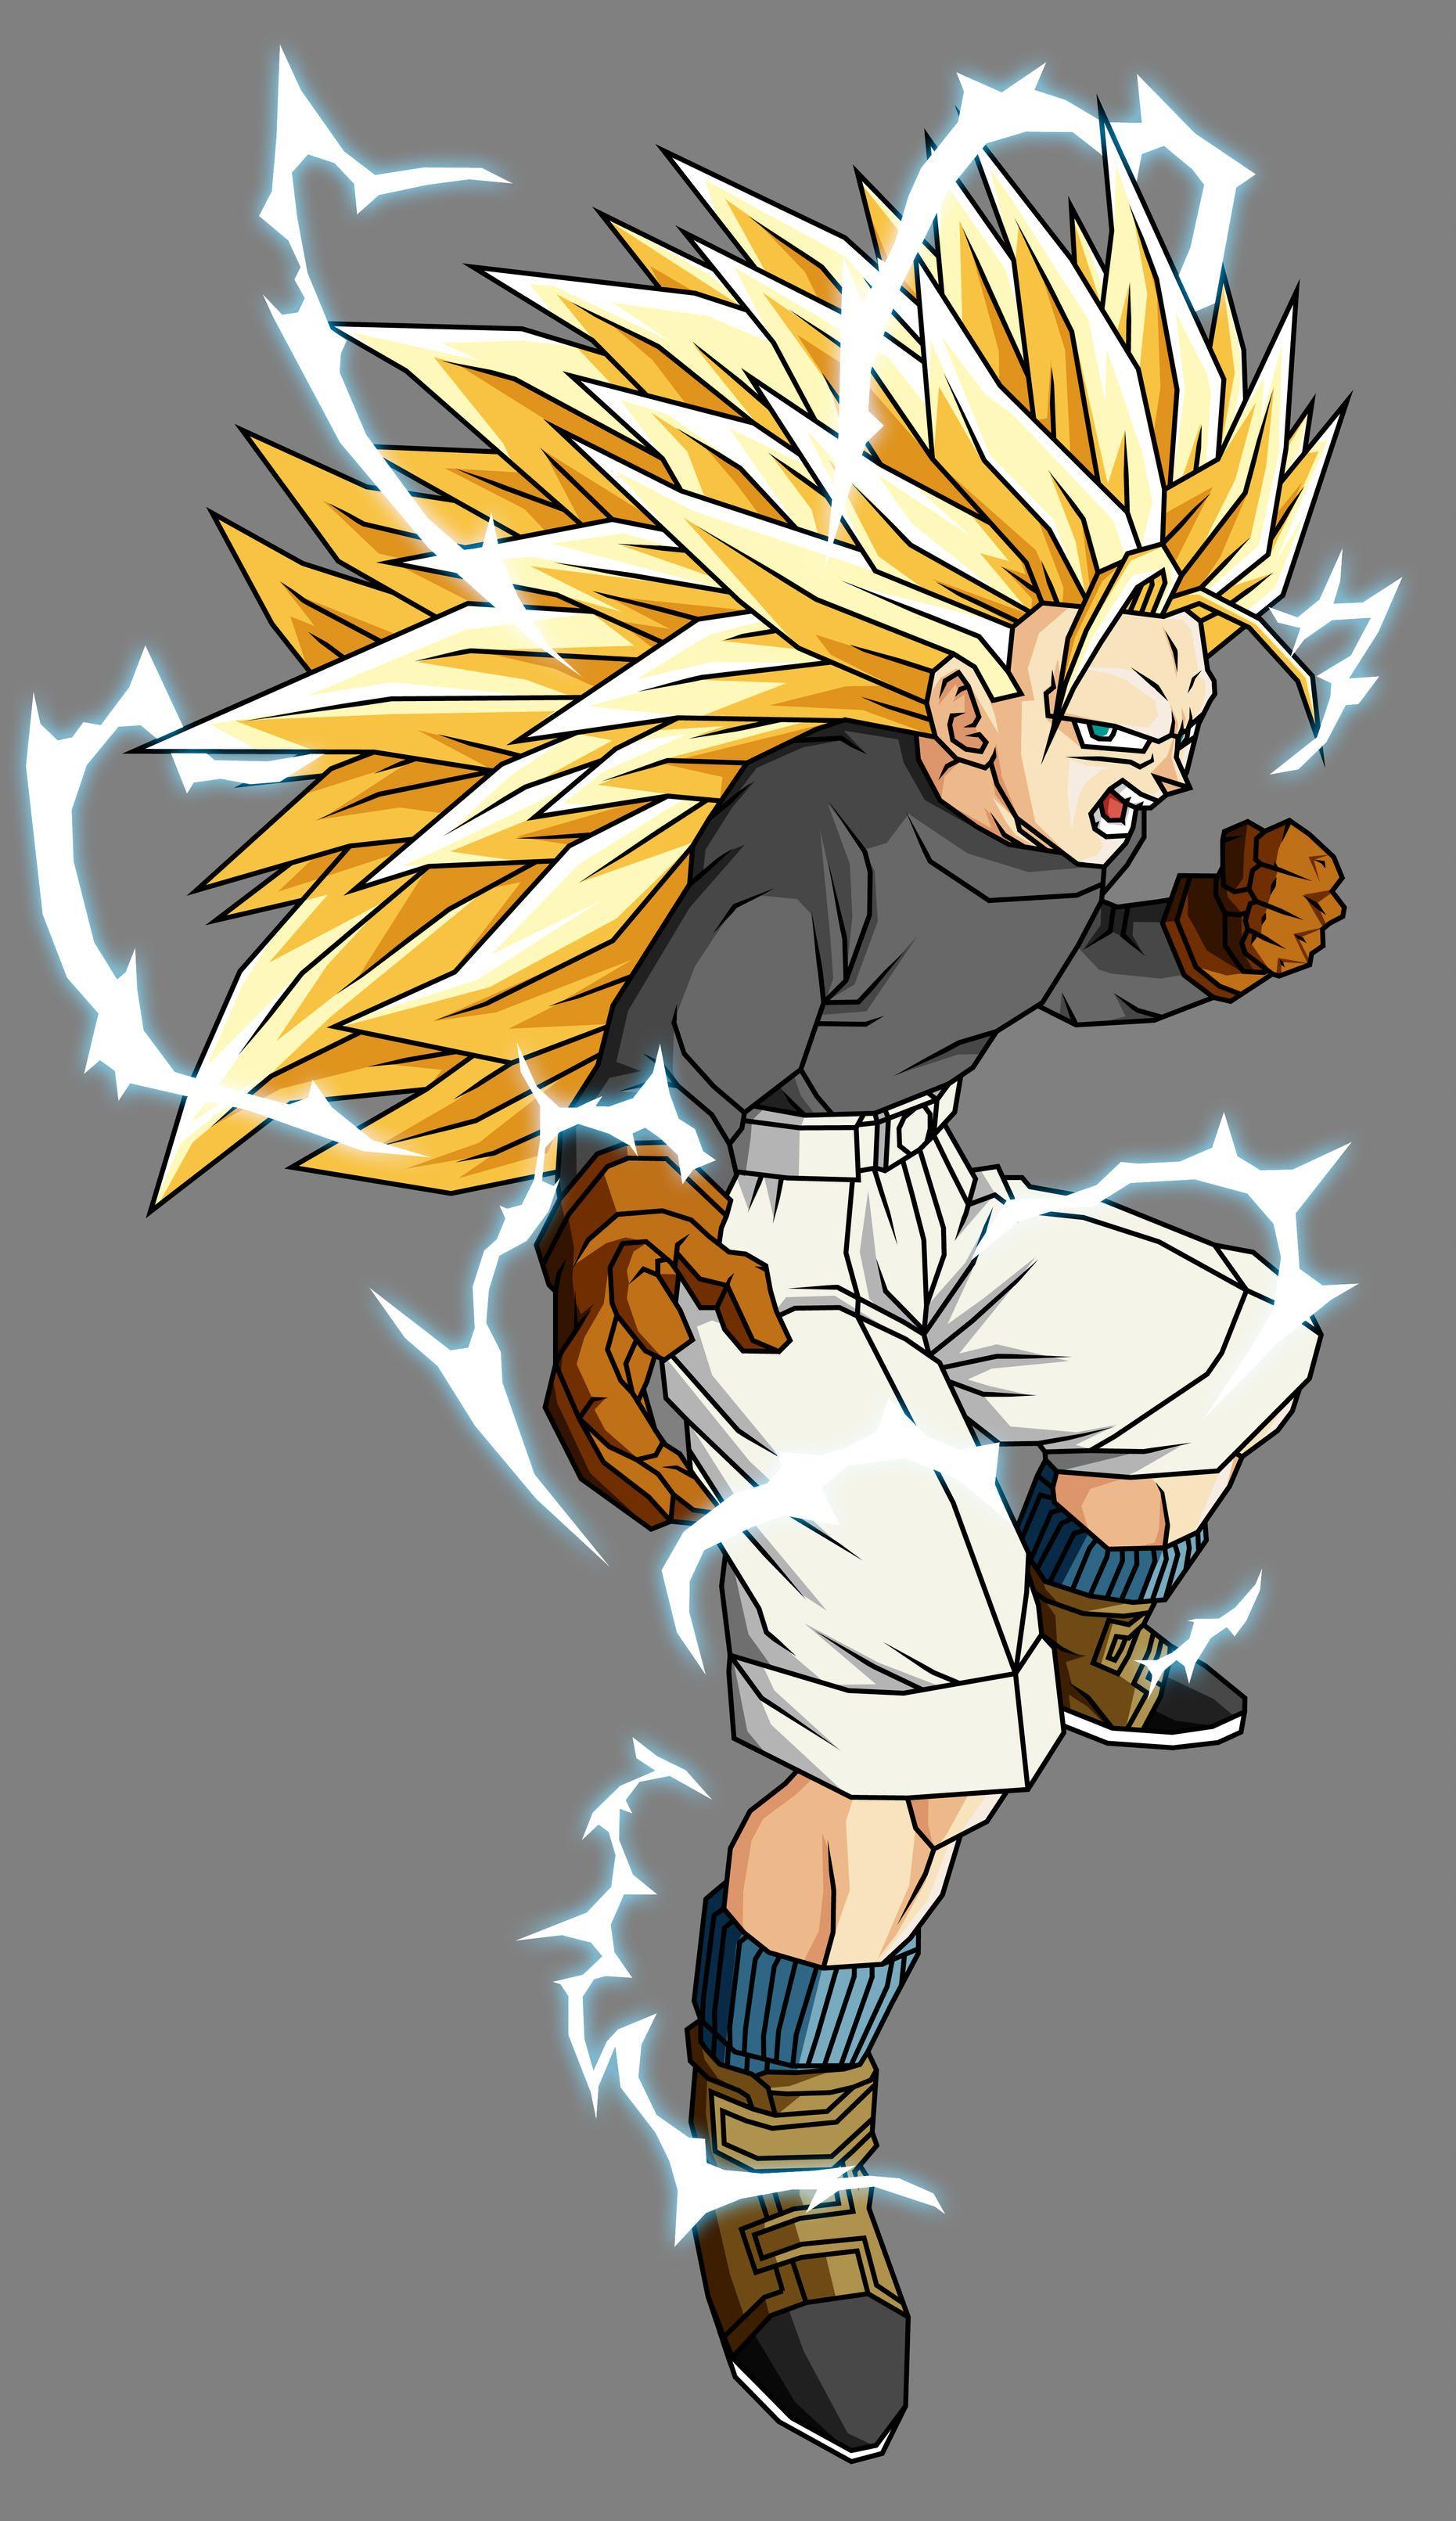 Trunks Gt Ssj3 By Theothersmen Dragon Ball Art Dragon Ball Artwork Anime Dragon Ball